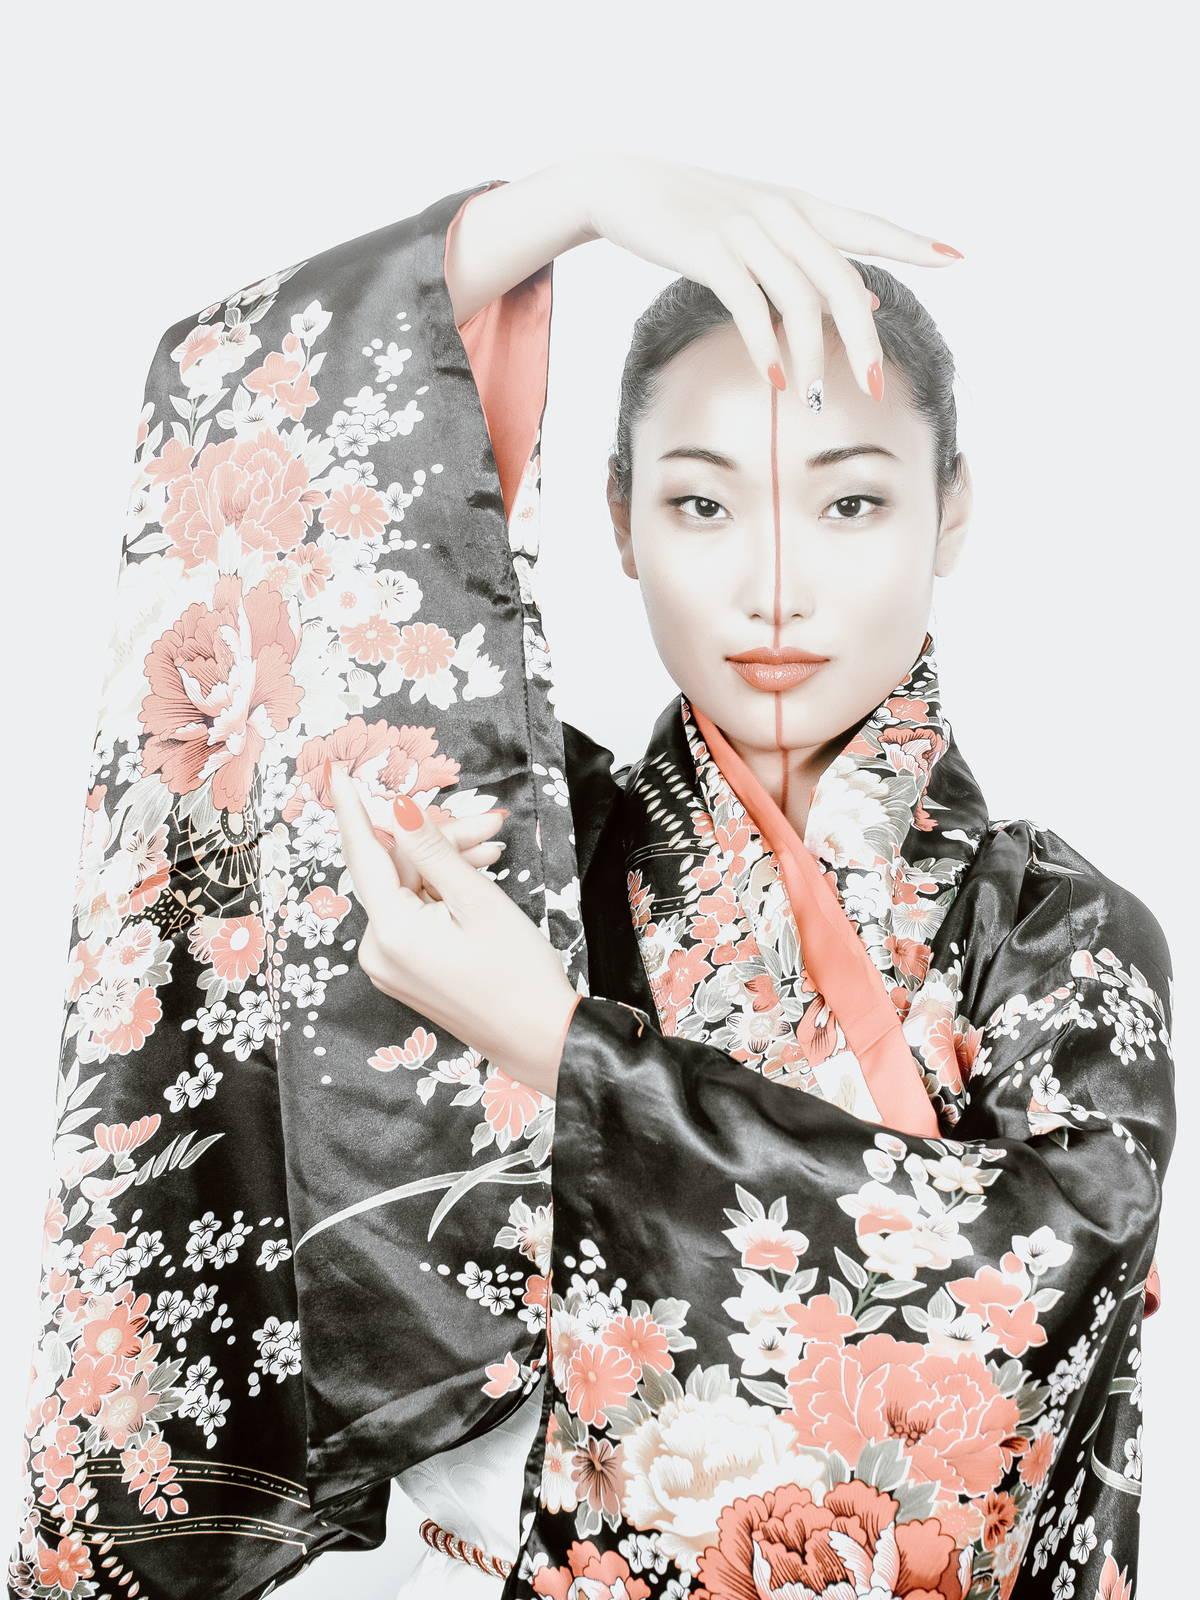 Tozaime - Geisha with Kimono and modern make-up interpretation